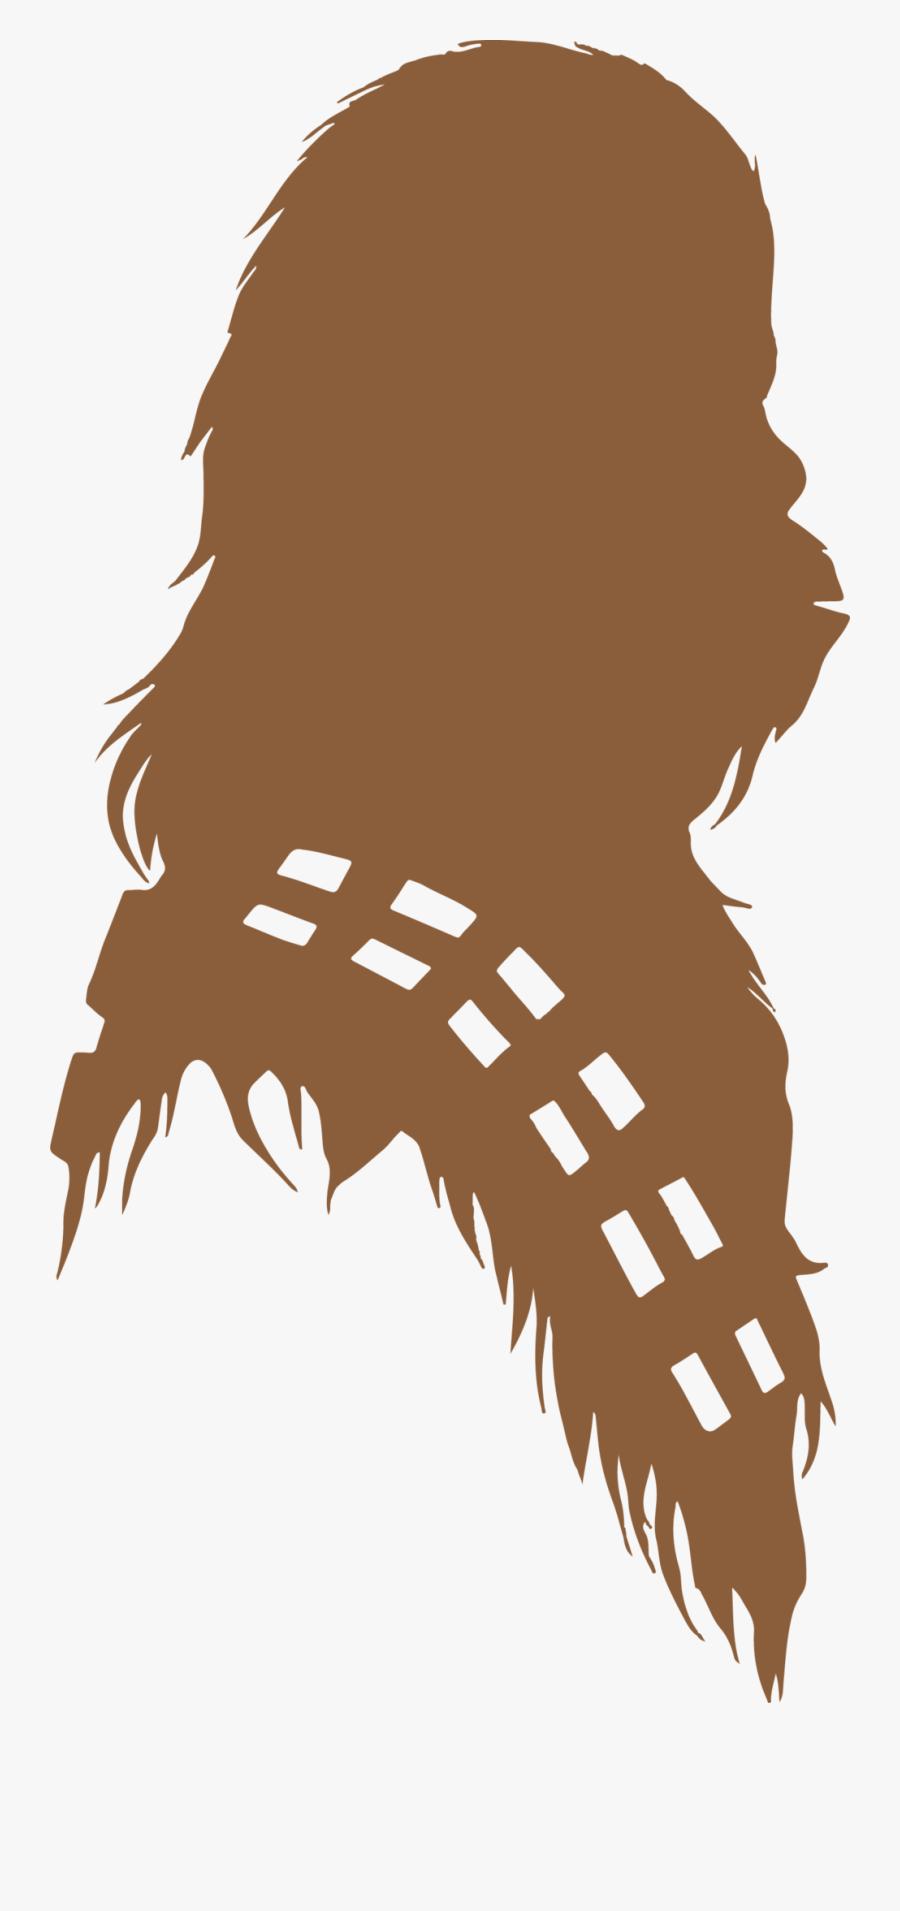 Chewbacca Silhouette - Star Wars Chewbacca Silhouette, Transparent Clipart